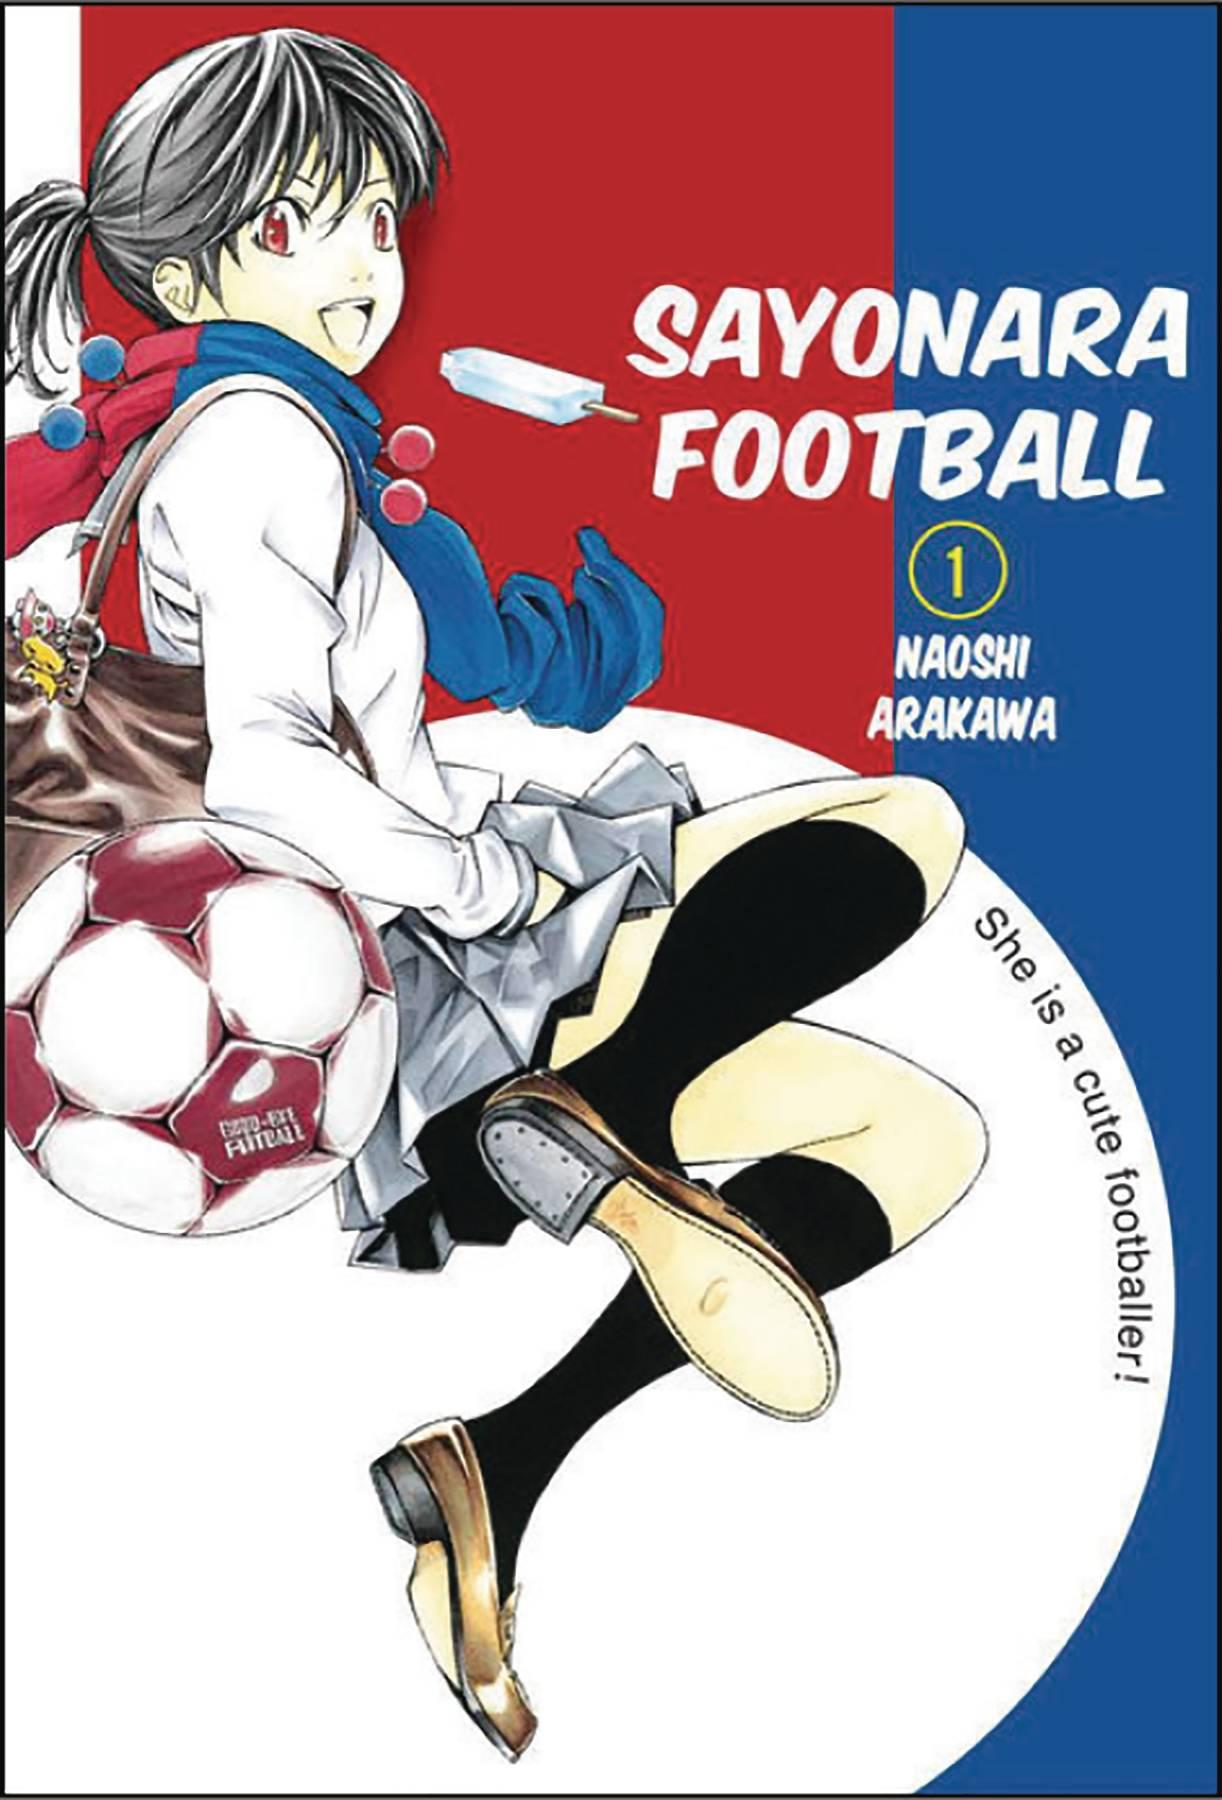 SAYONARA FOOTBALL GN 01